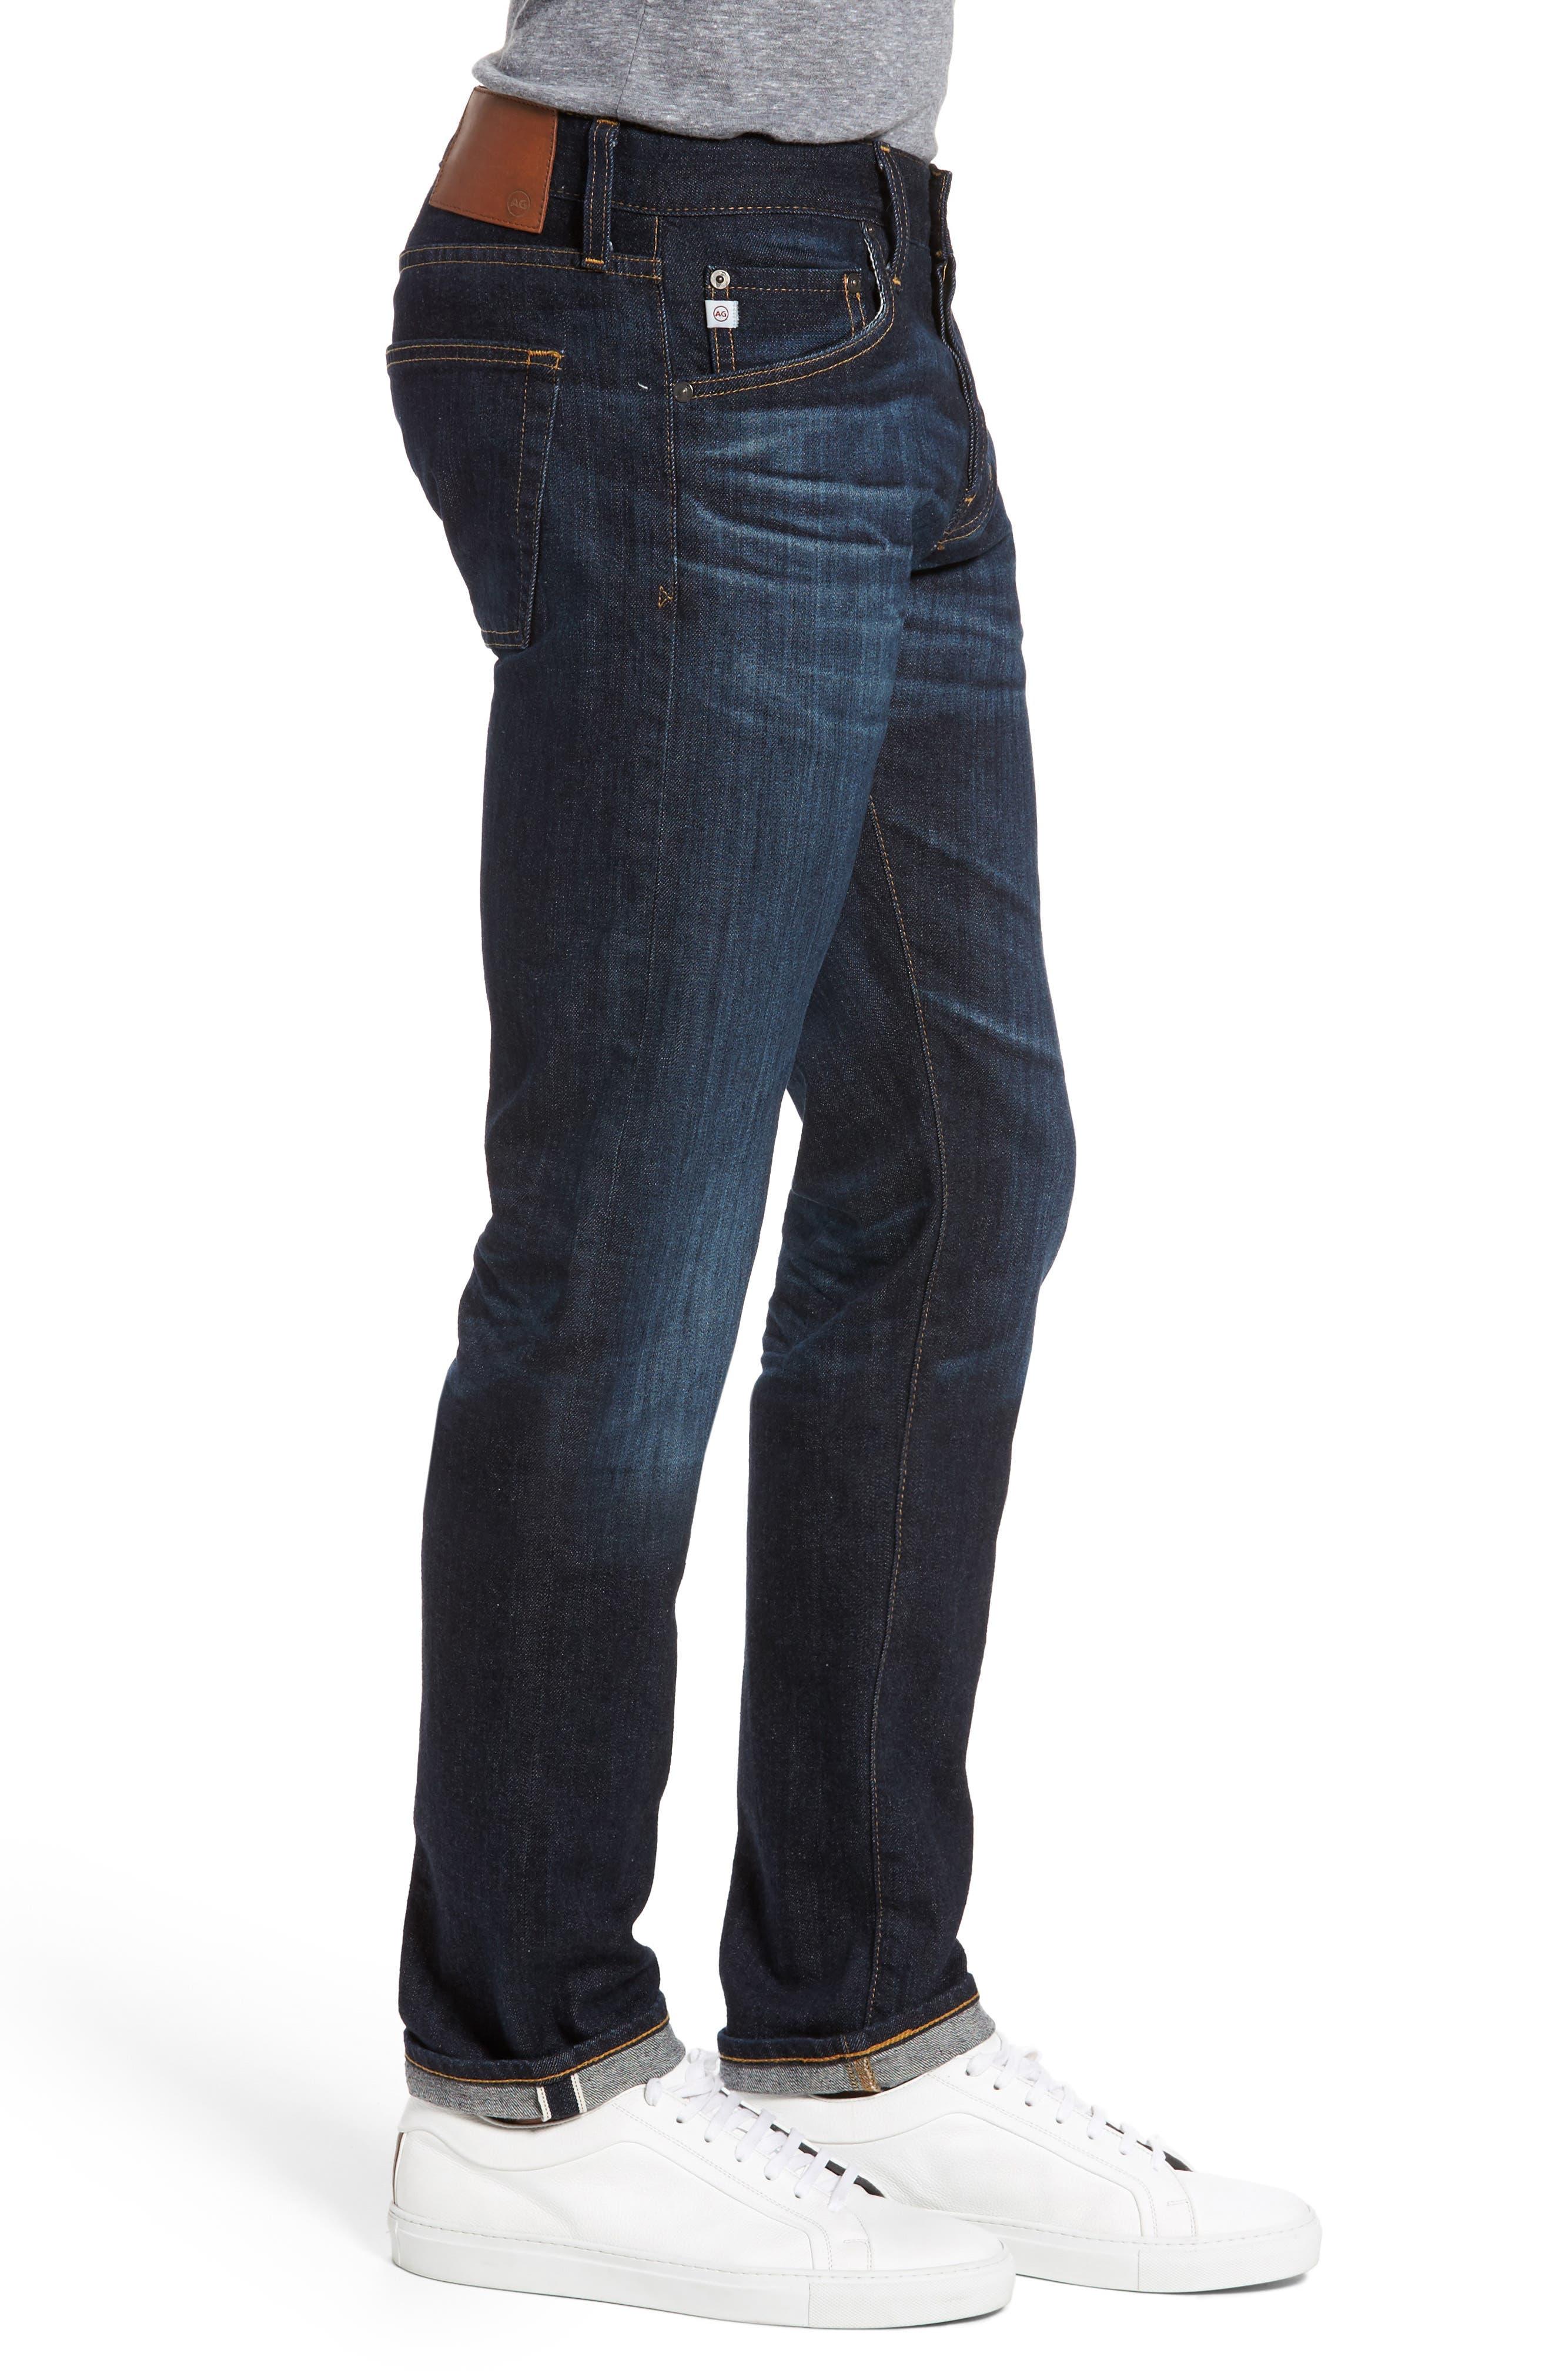 Tellis Slim Fit Jeans,                             Alternate thumbnail 3, color,                             2 Years Jinx